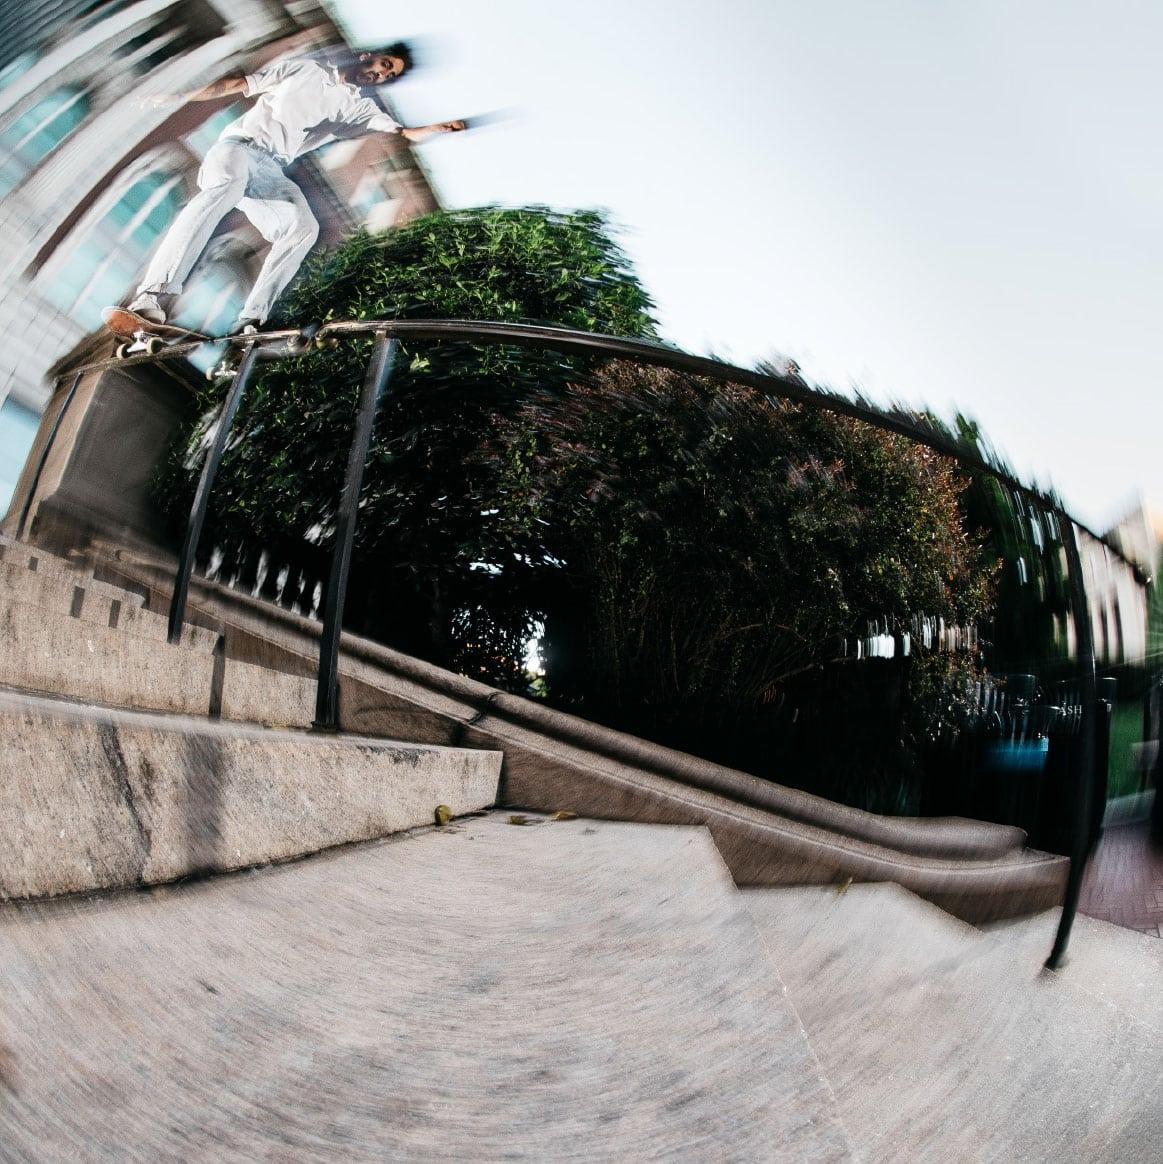 pacel-khachab-boardslide-irregularskatemag-skateboarding-nyc-trip-fabian-reichenbach